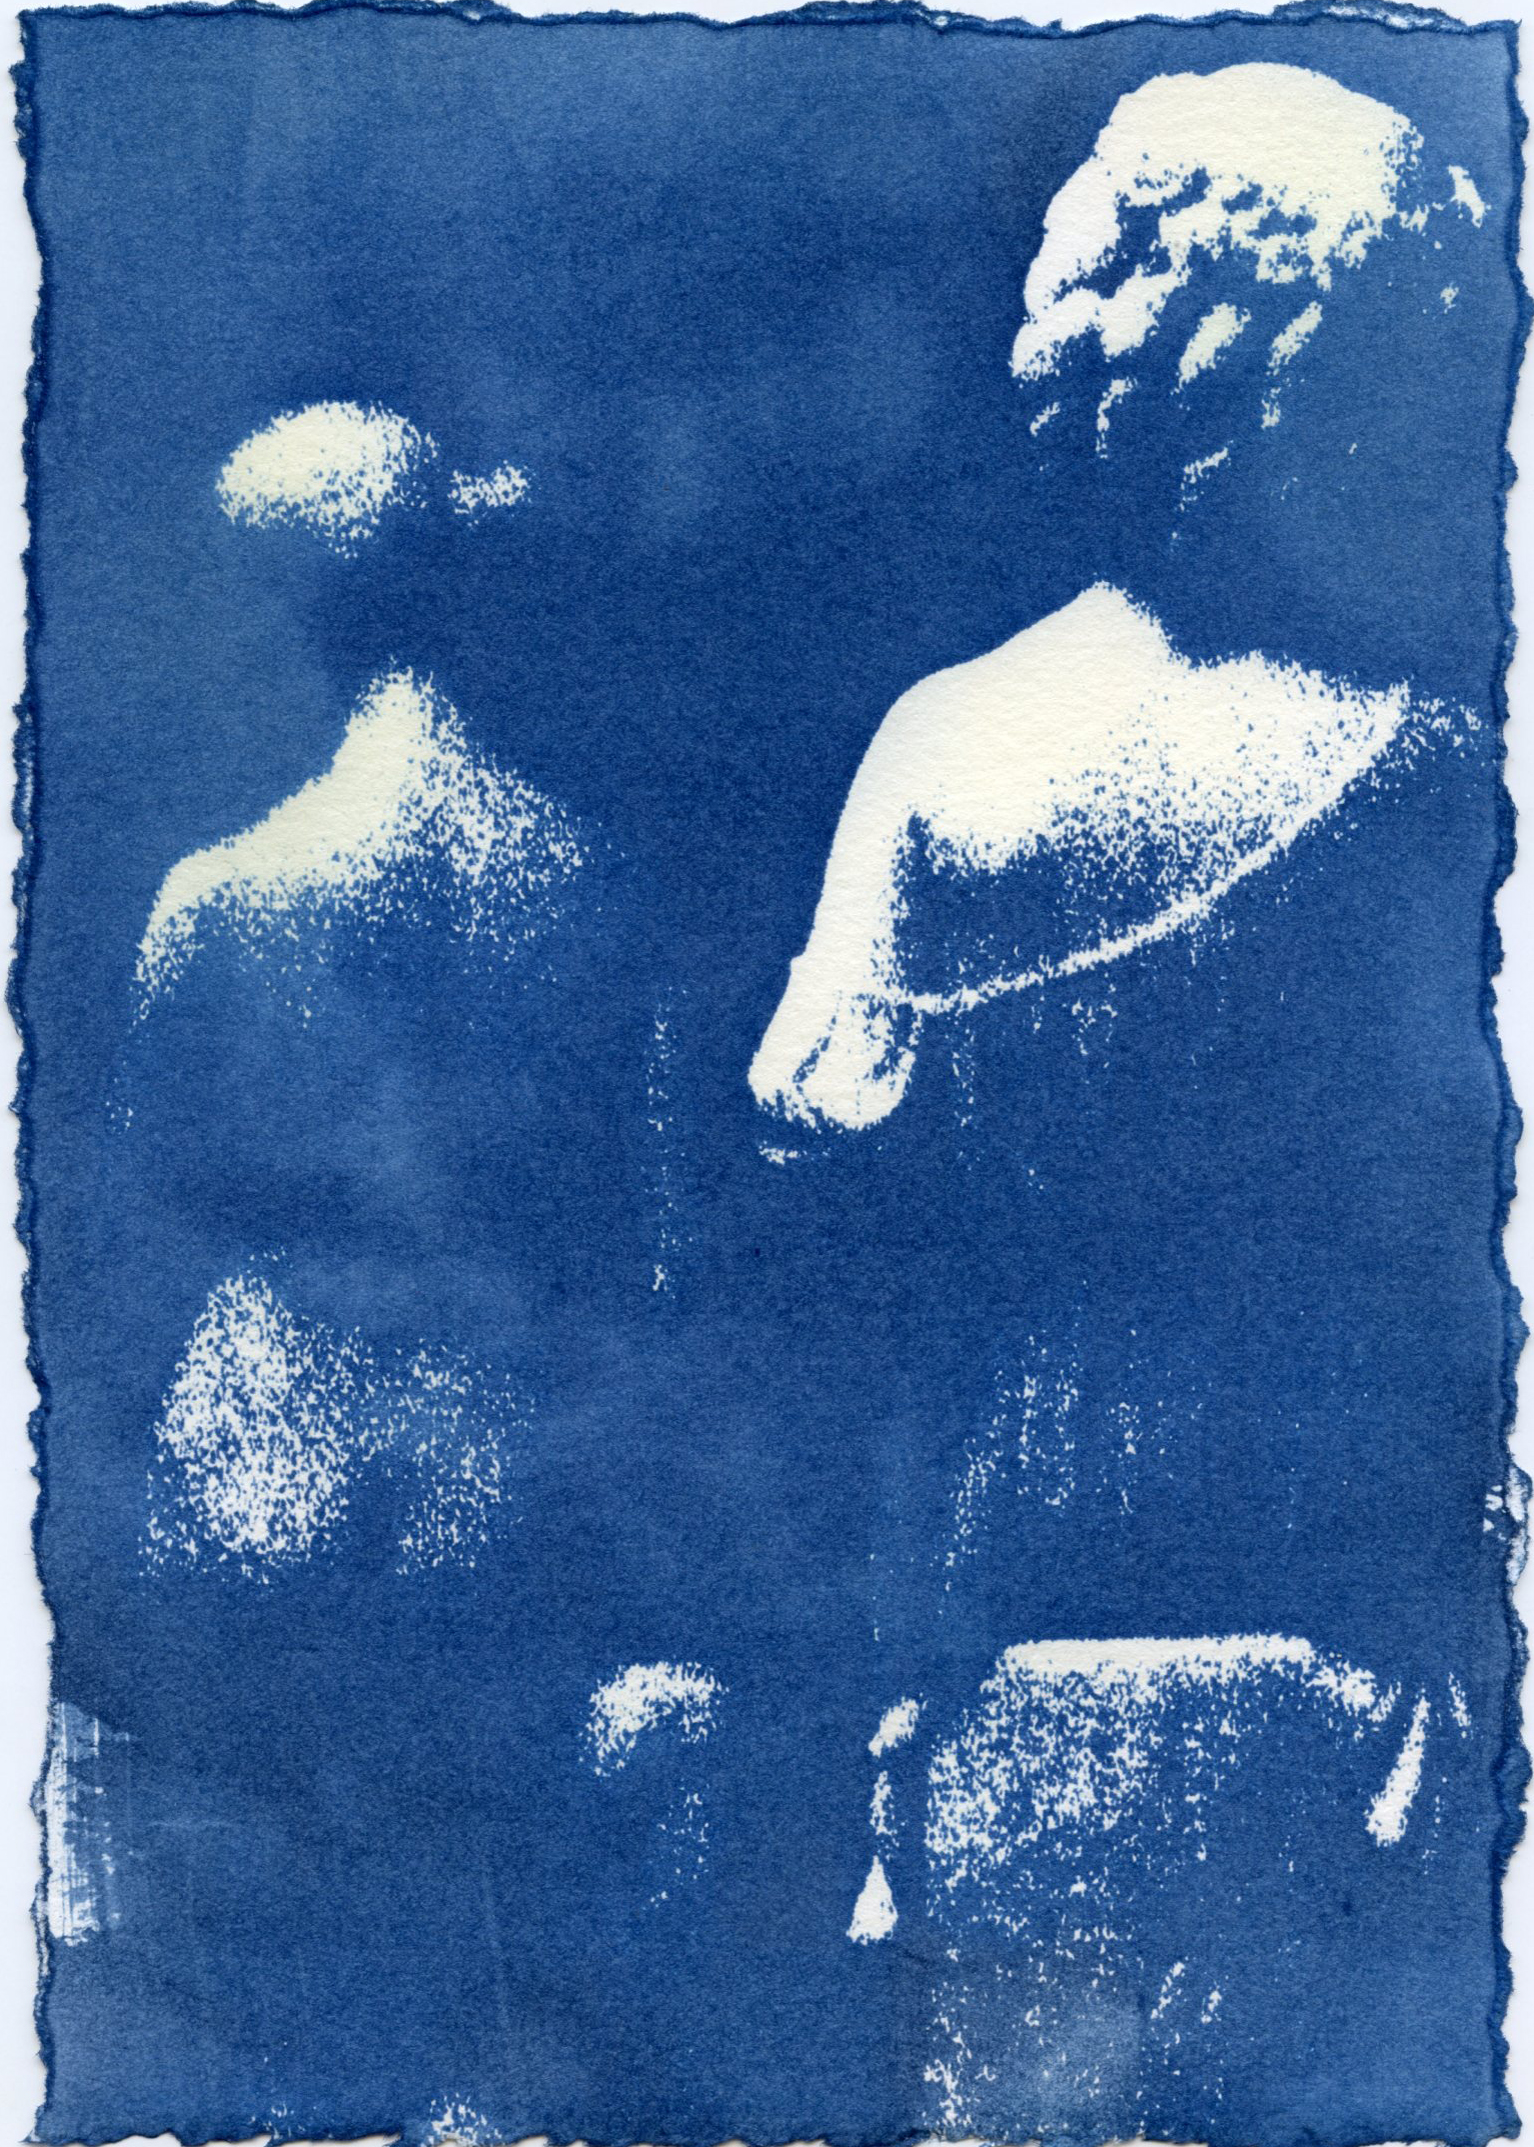 cyanotypes-005.jpg